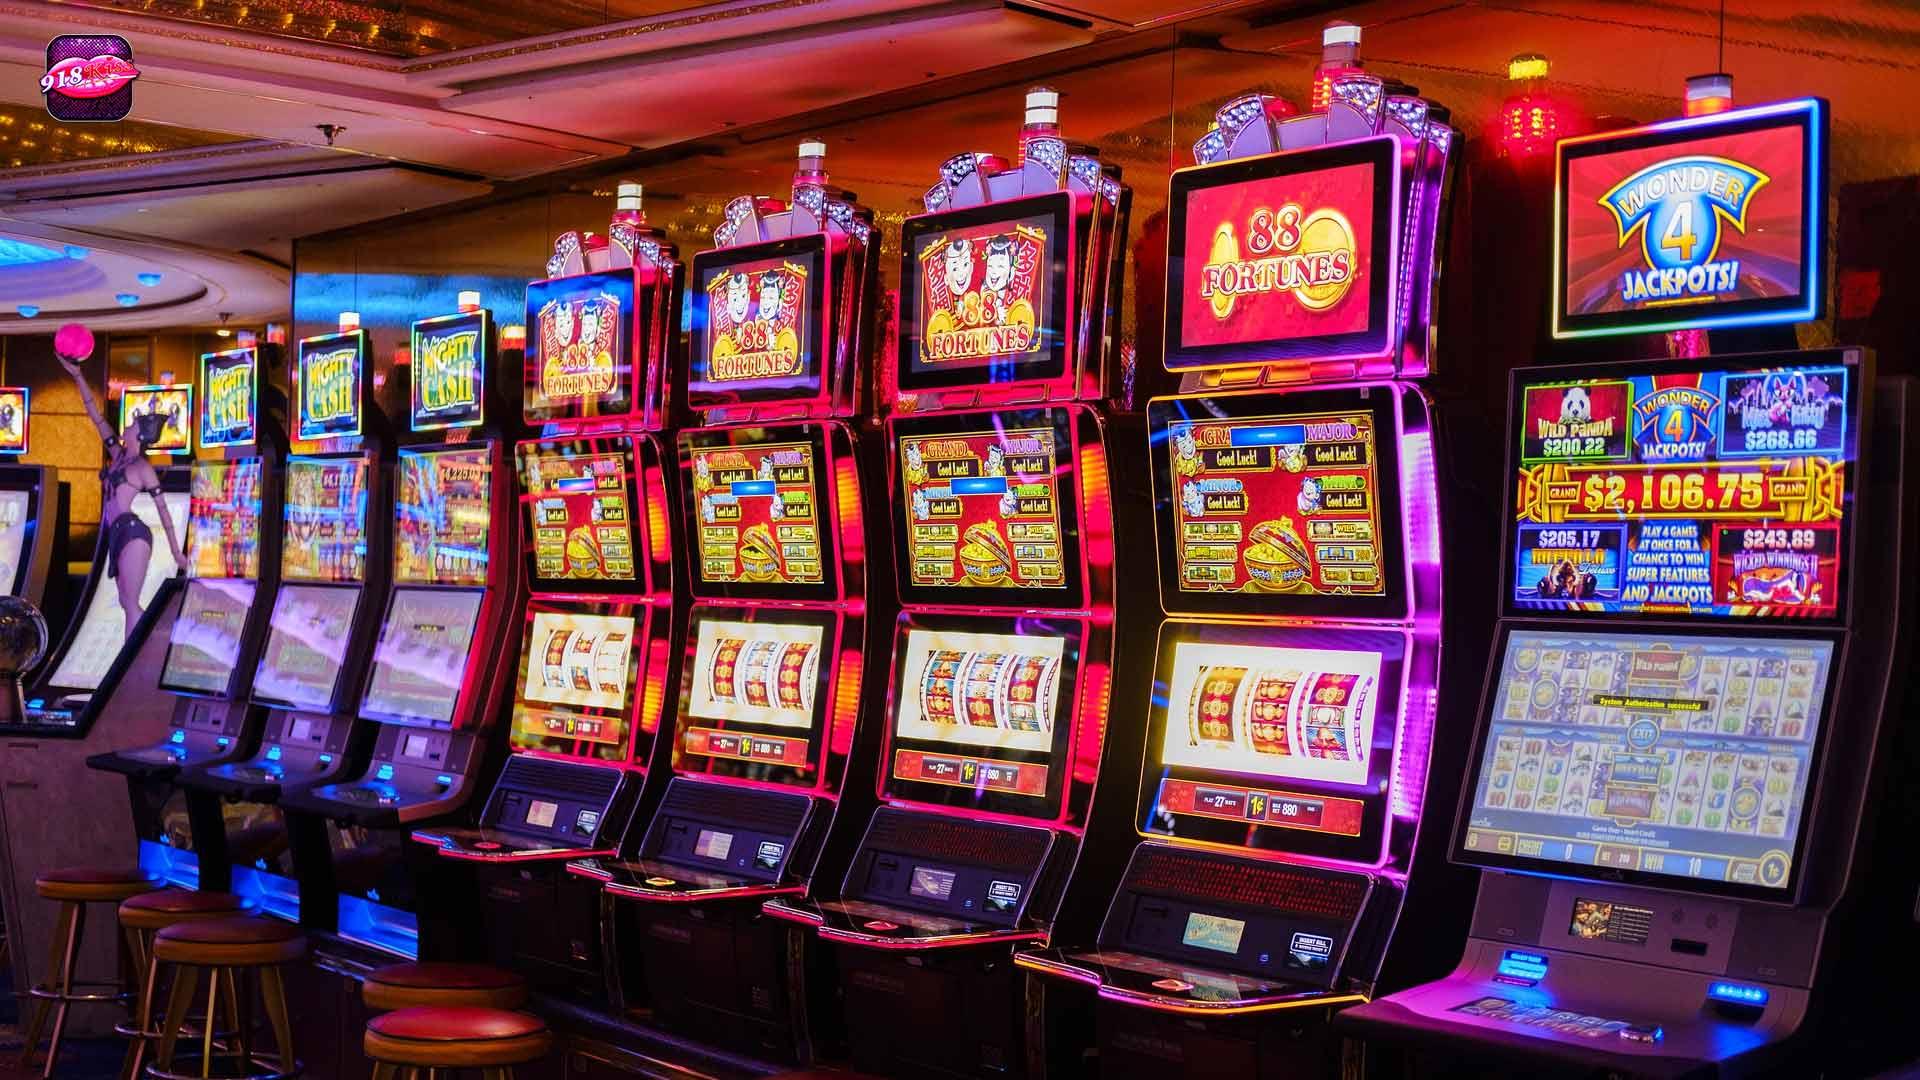 Belterra Park Hit With $2.7m+ Lawsuit Over Video Gambling Revenue